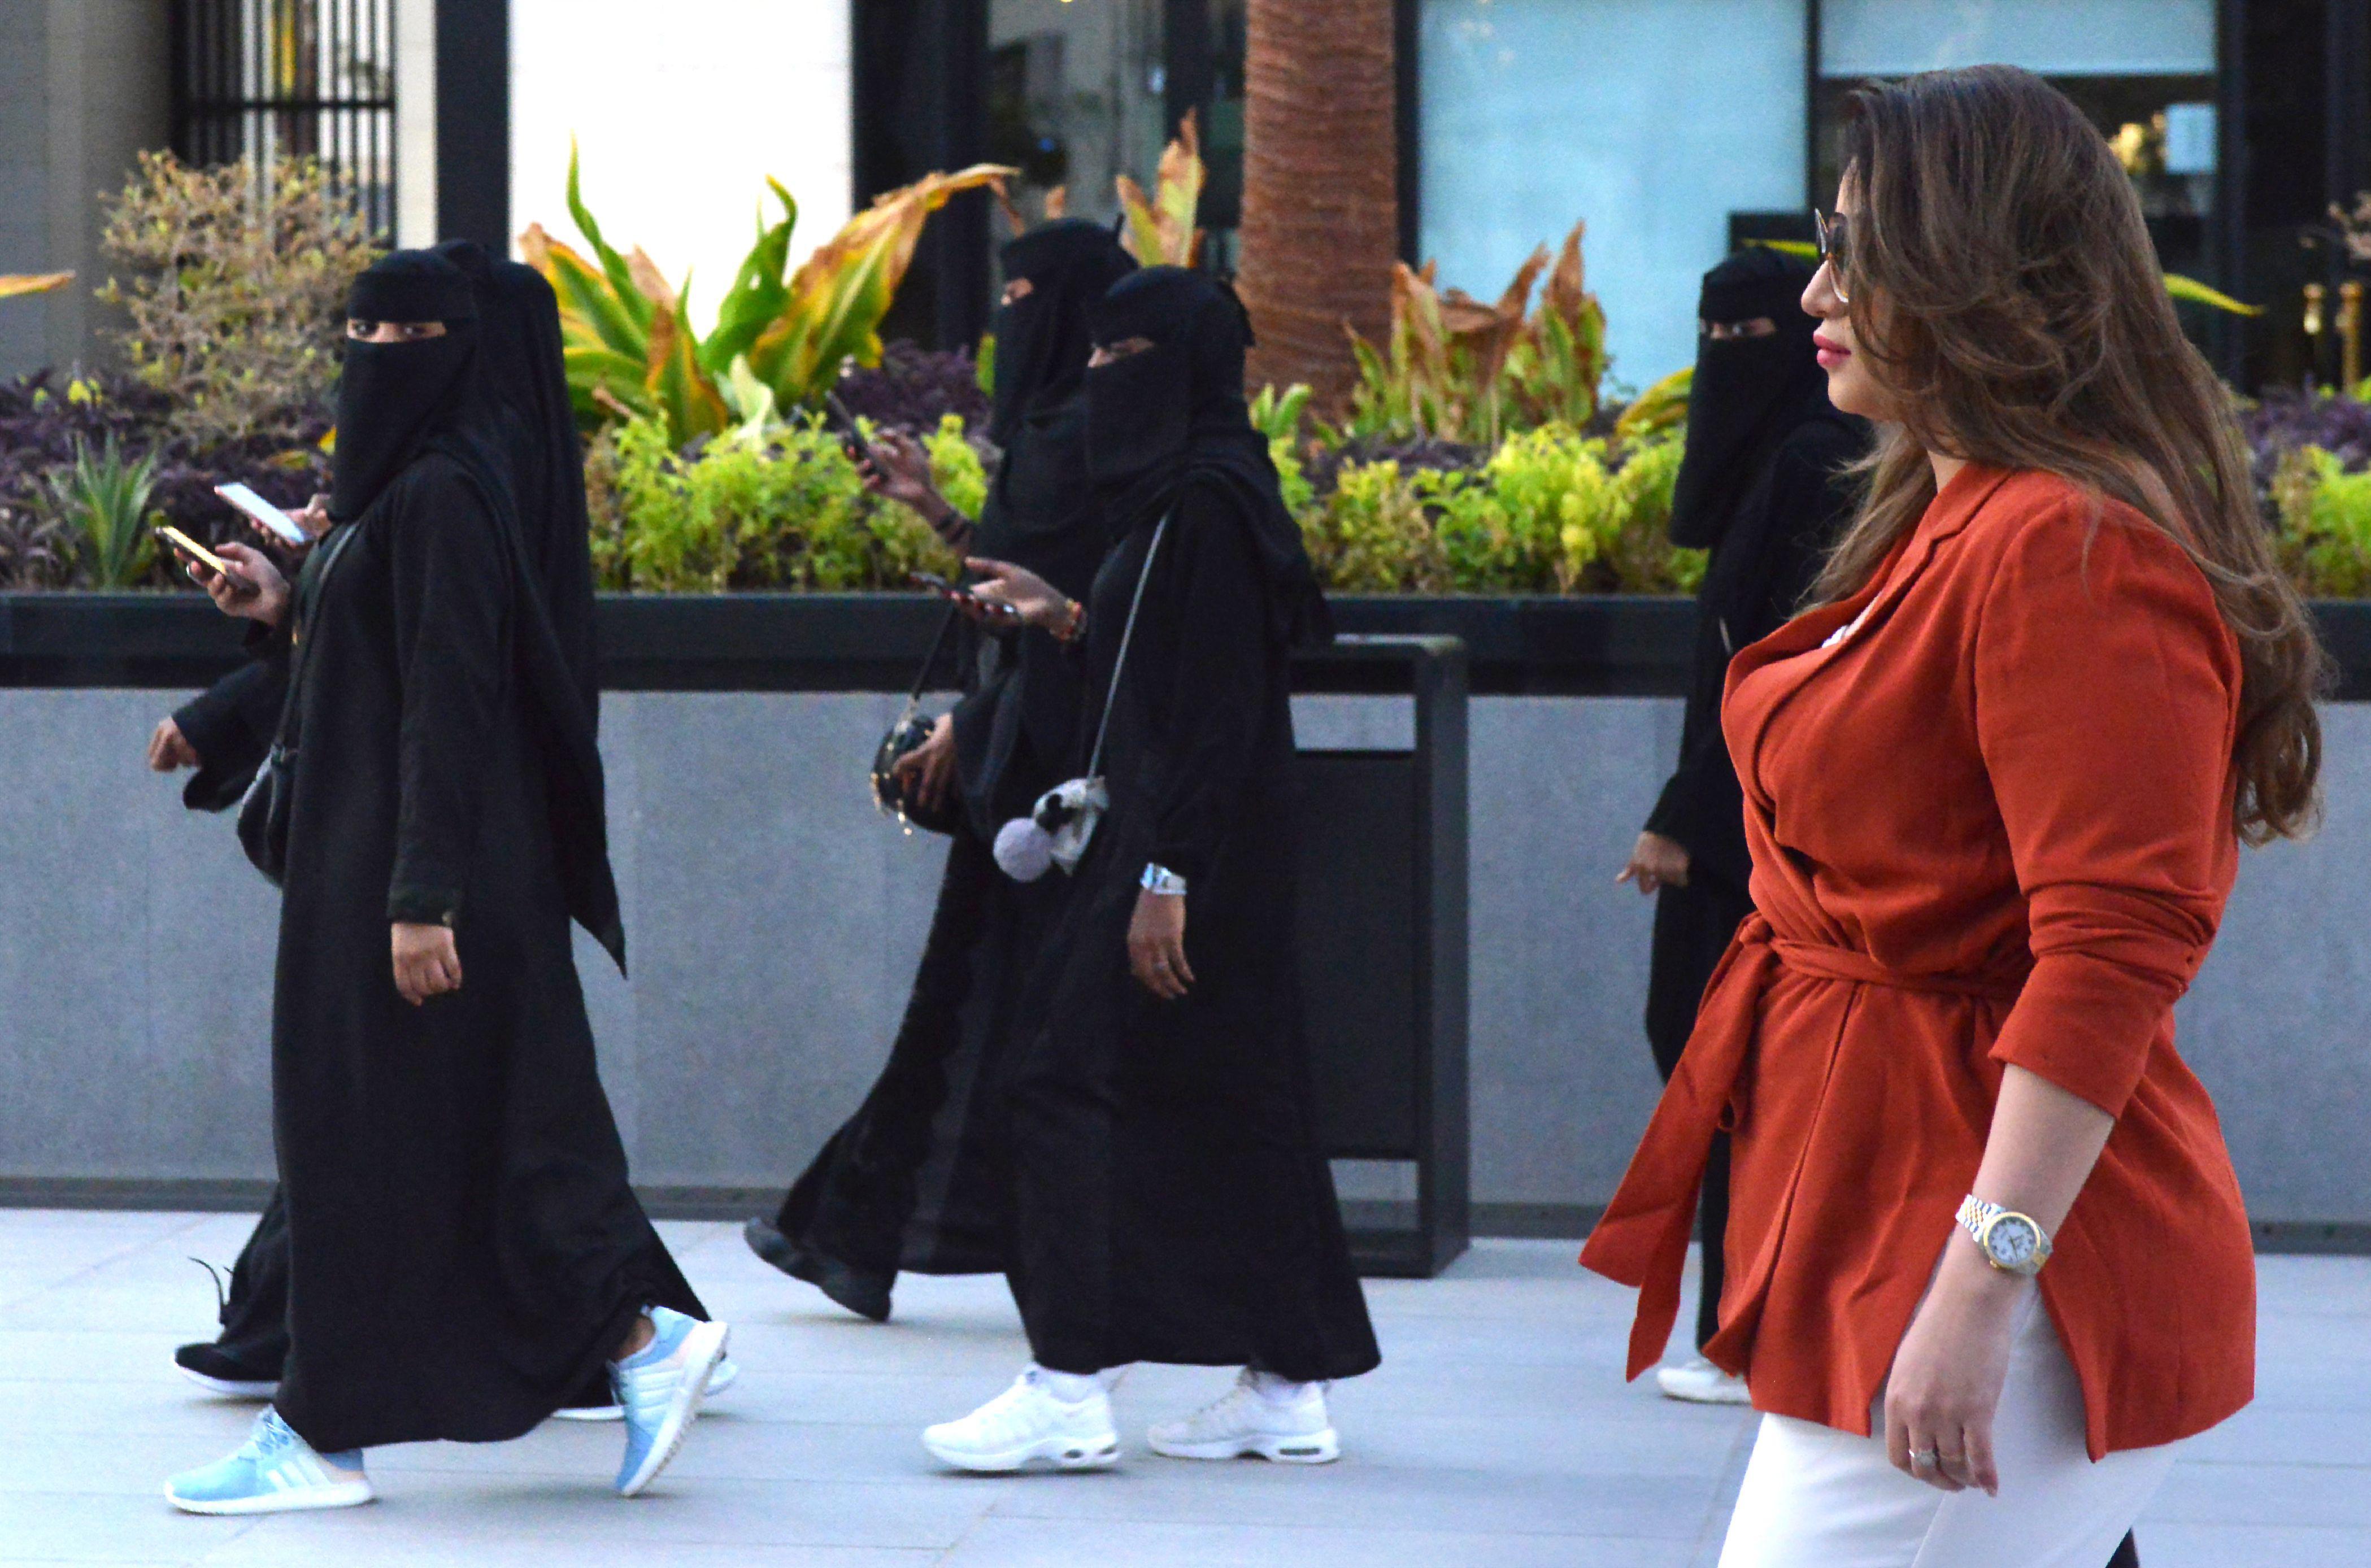 L'abaya, un héritage culturel en Arabie saoudite